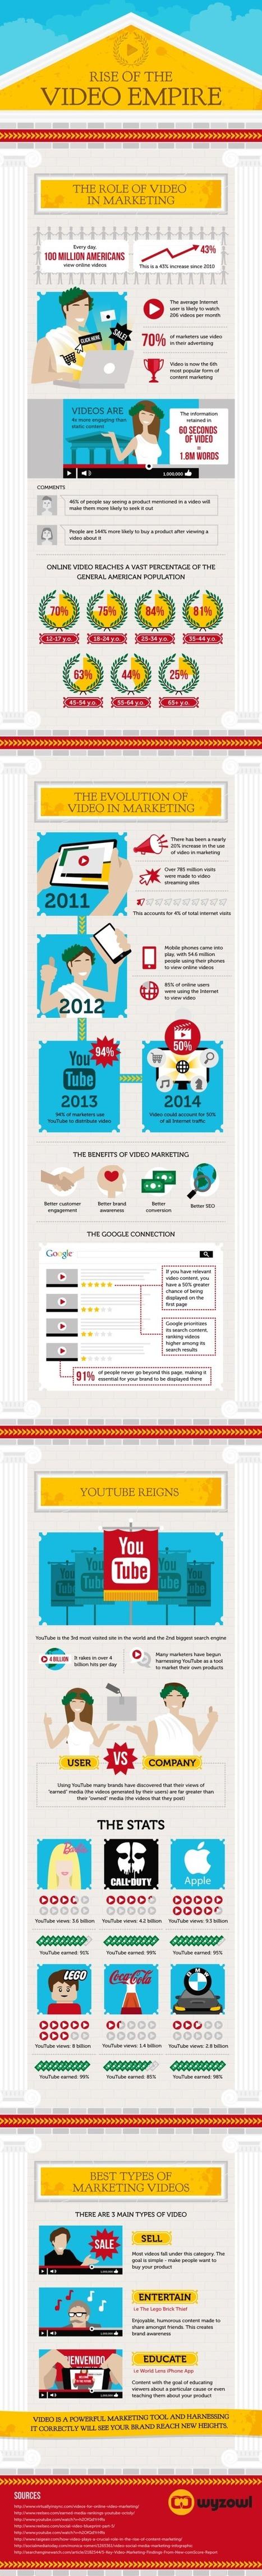 Infographic: The Rise of Video Marketing - Marketing Technology Blog | #TheMarketingTechAlert | Social Medial Marketing | Scoop.it